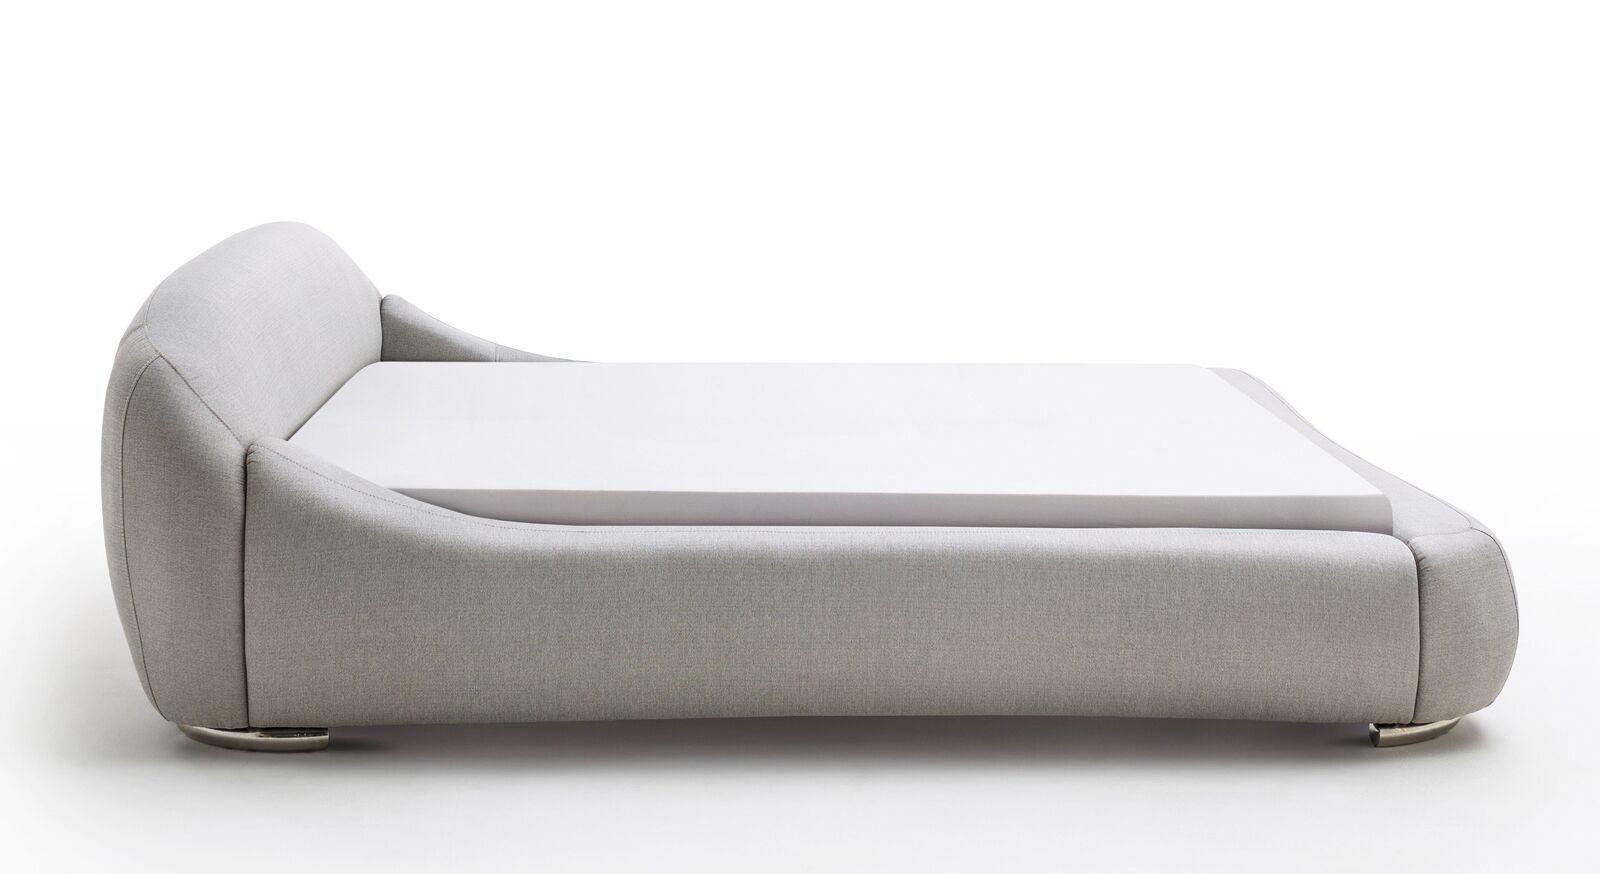 Weich gepolstertes Bett Condea